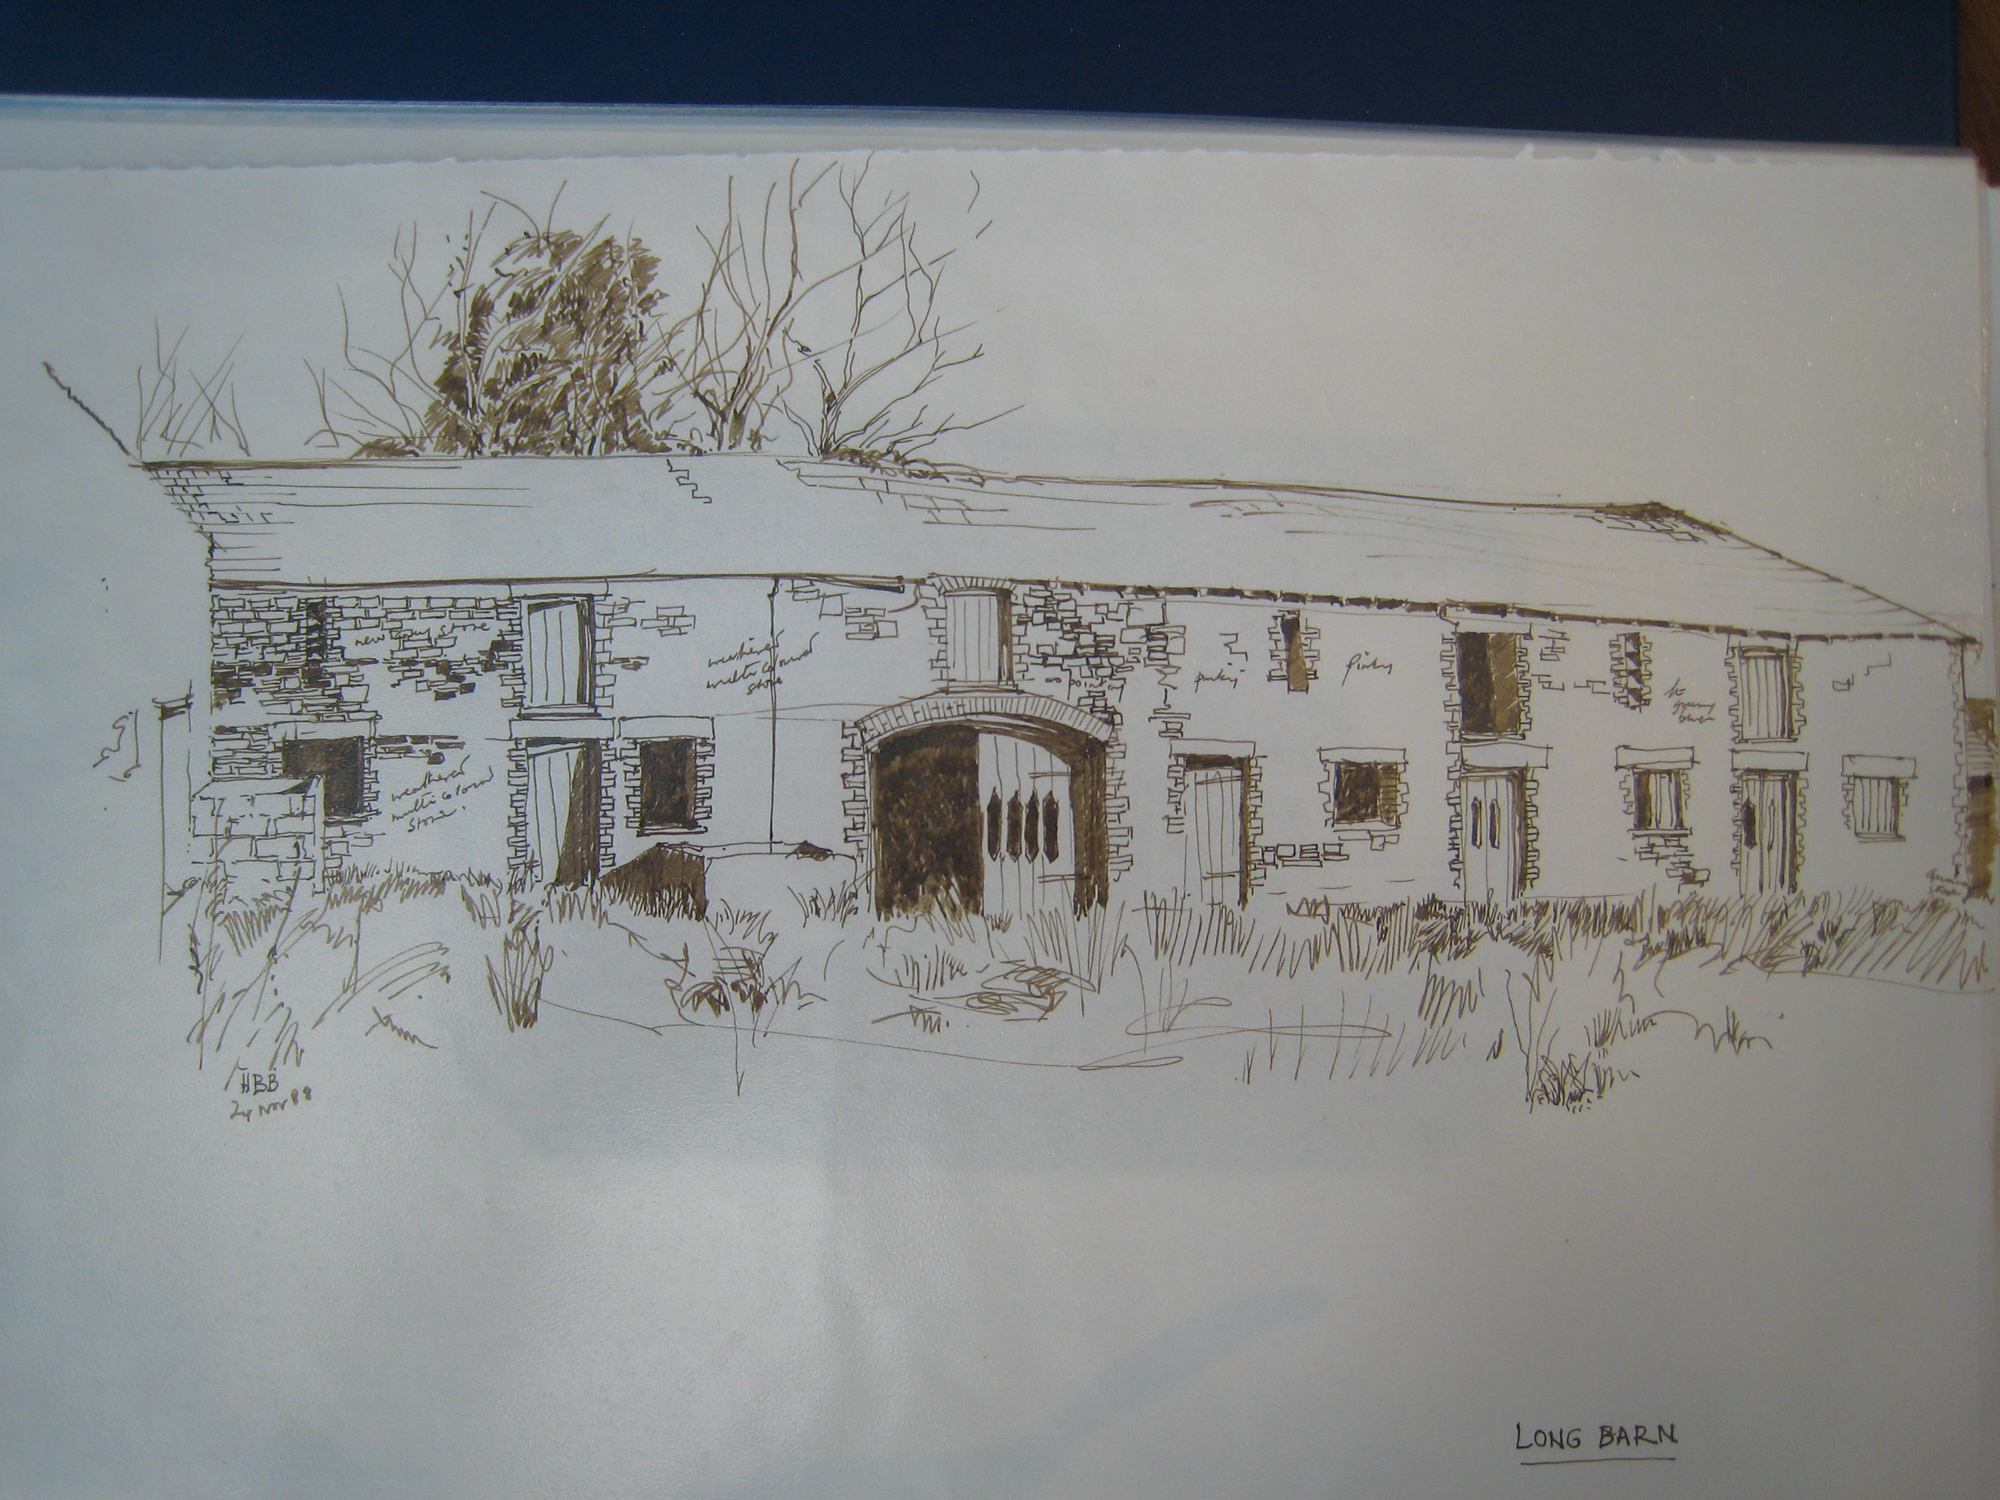 Homeliving: Long Barn, drawing